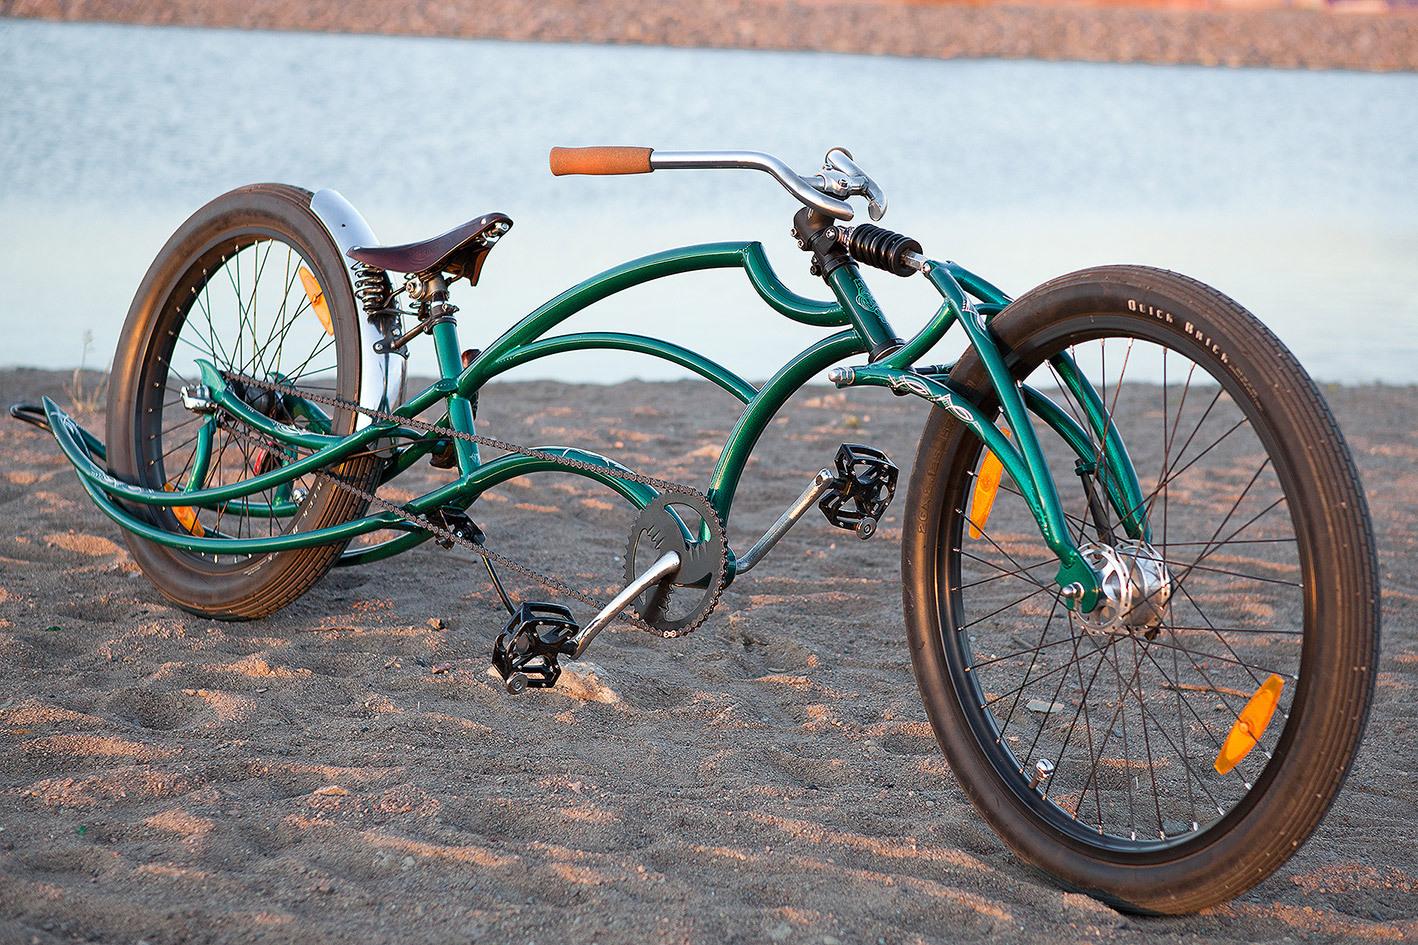 велосипед сидушкой хуем видео